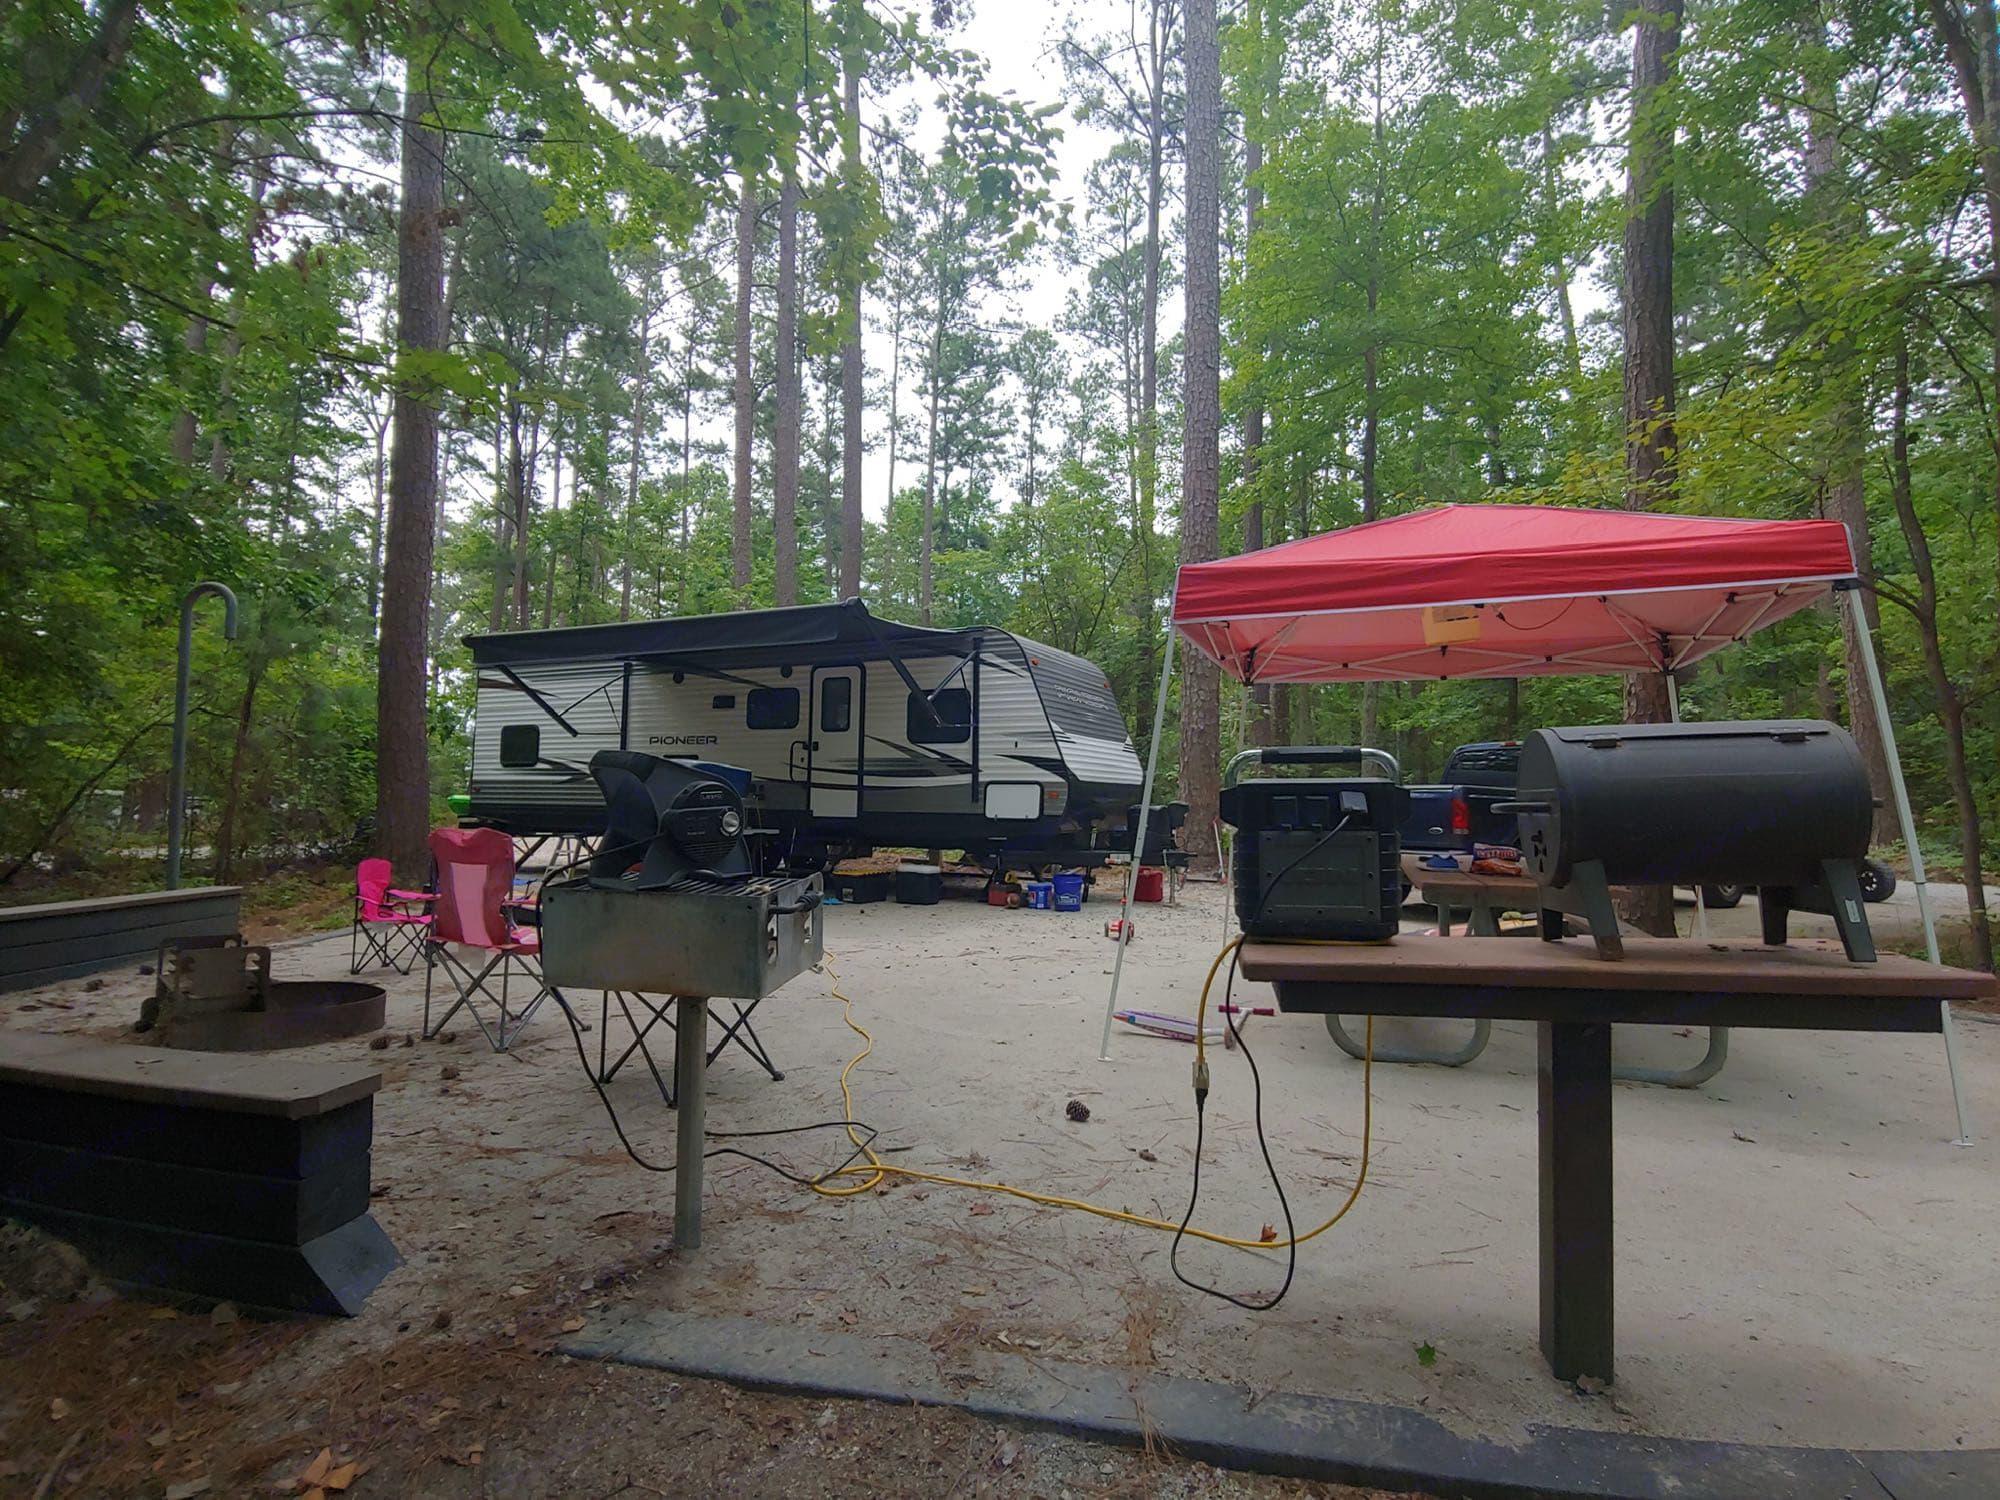 Camping at Ridge Road campground on Lake Thurmond.. Heartland Pioneer 2019